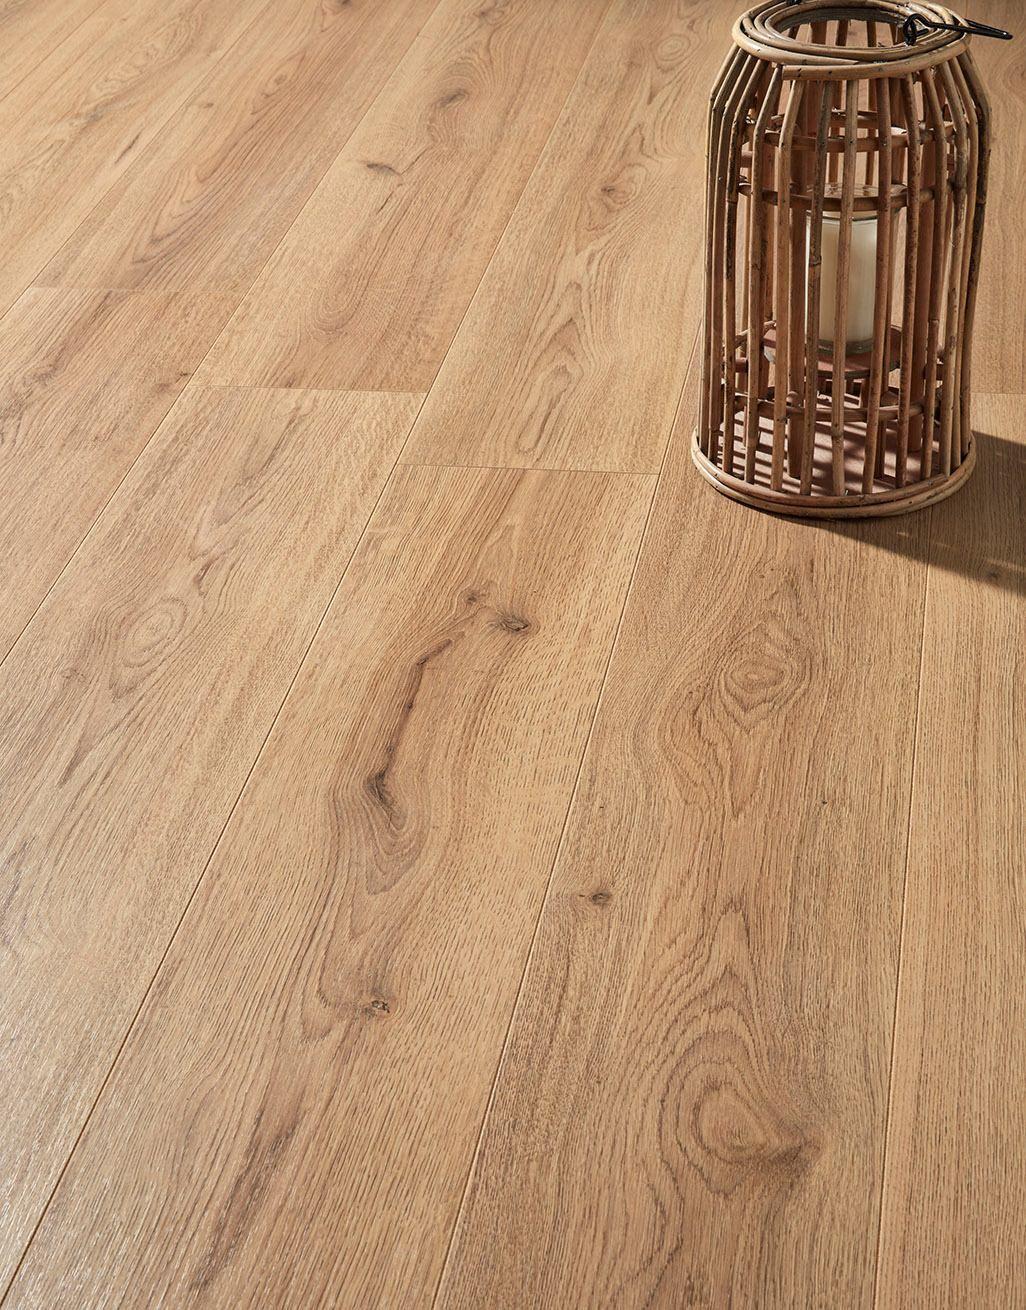 Loft Natural Oak Laminate Flooring, Real Wood Effect Laminate Flooring